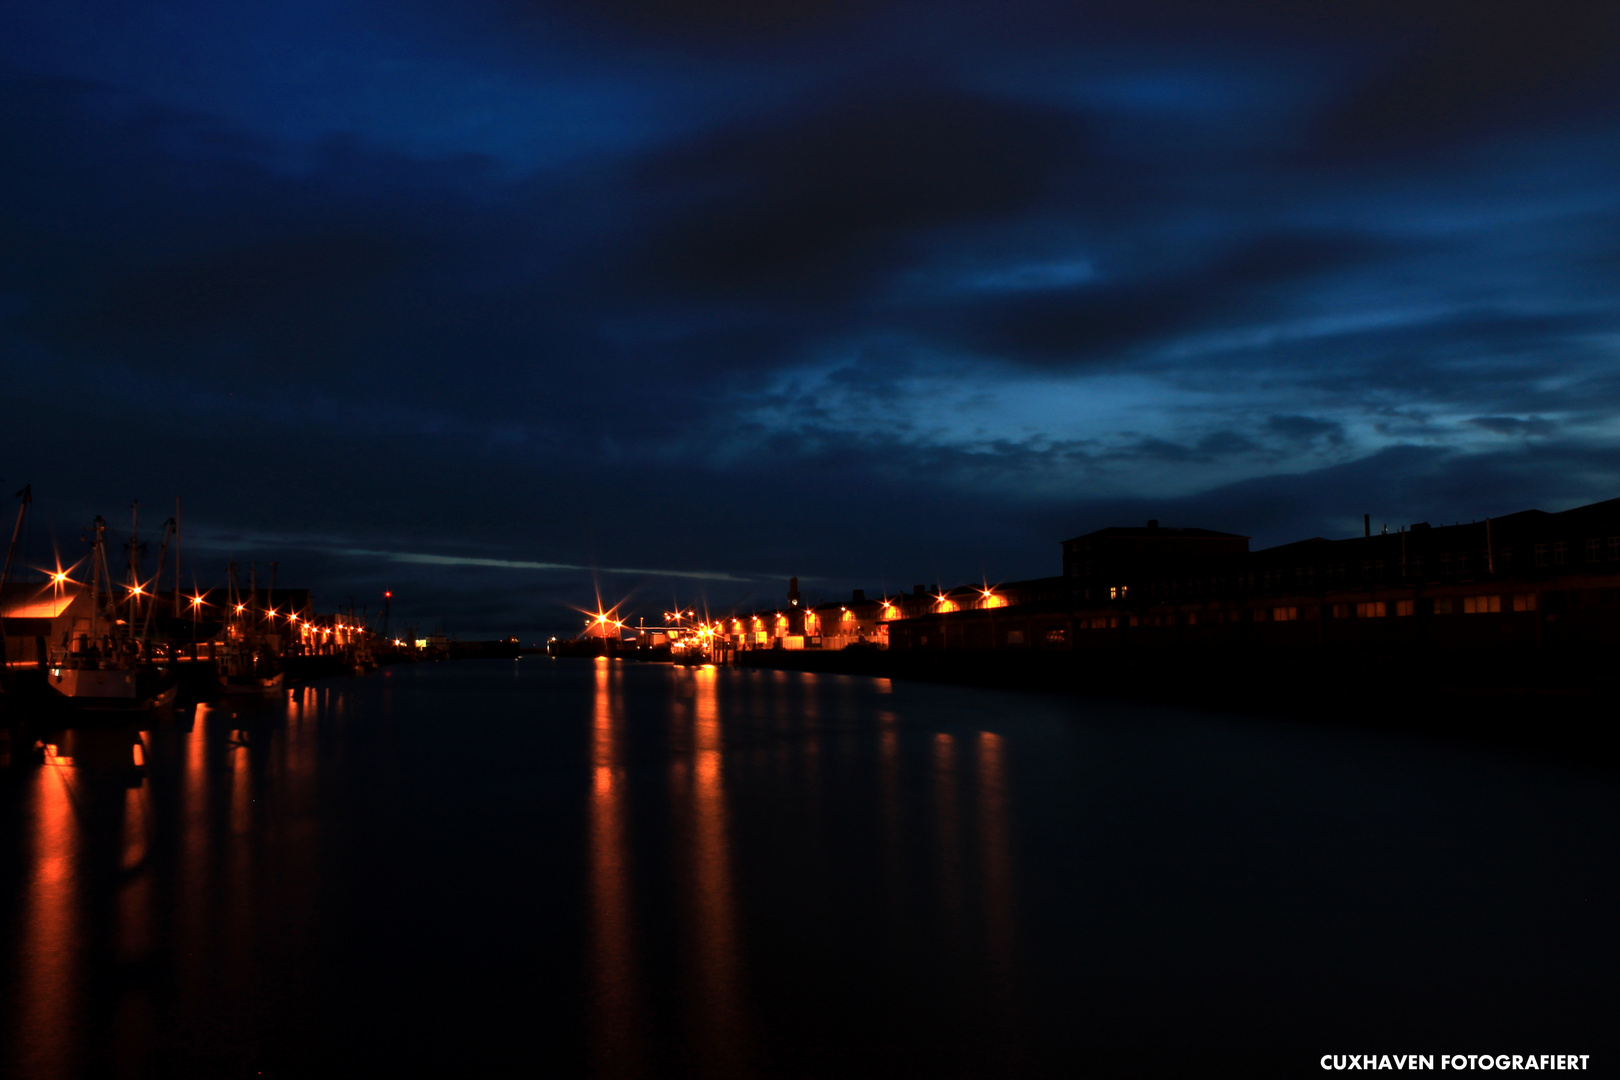 Hafen Cuxhaven